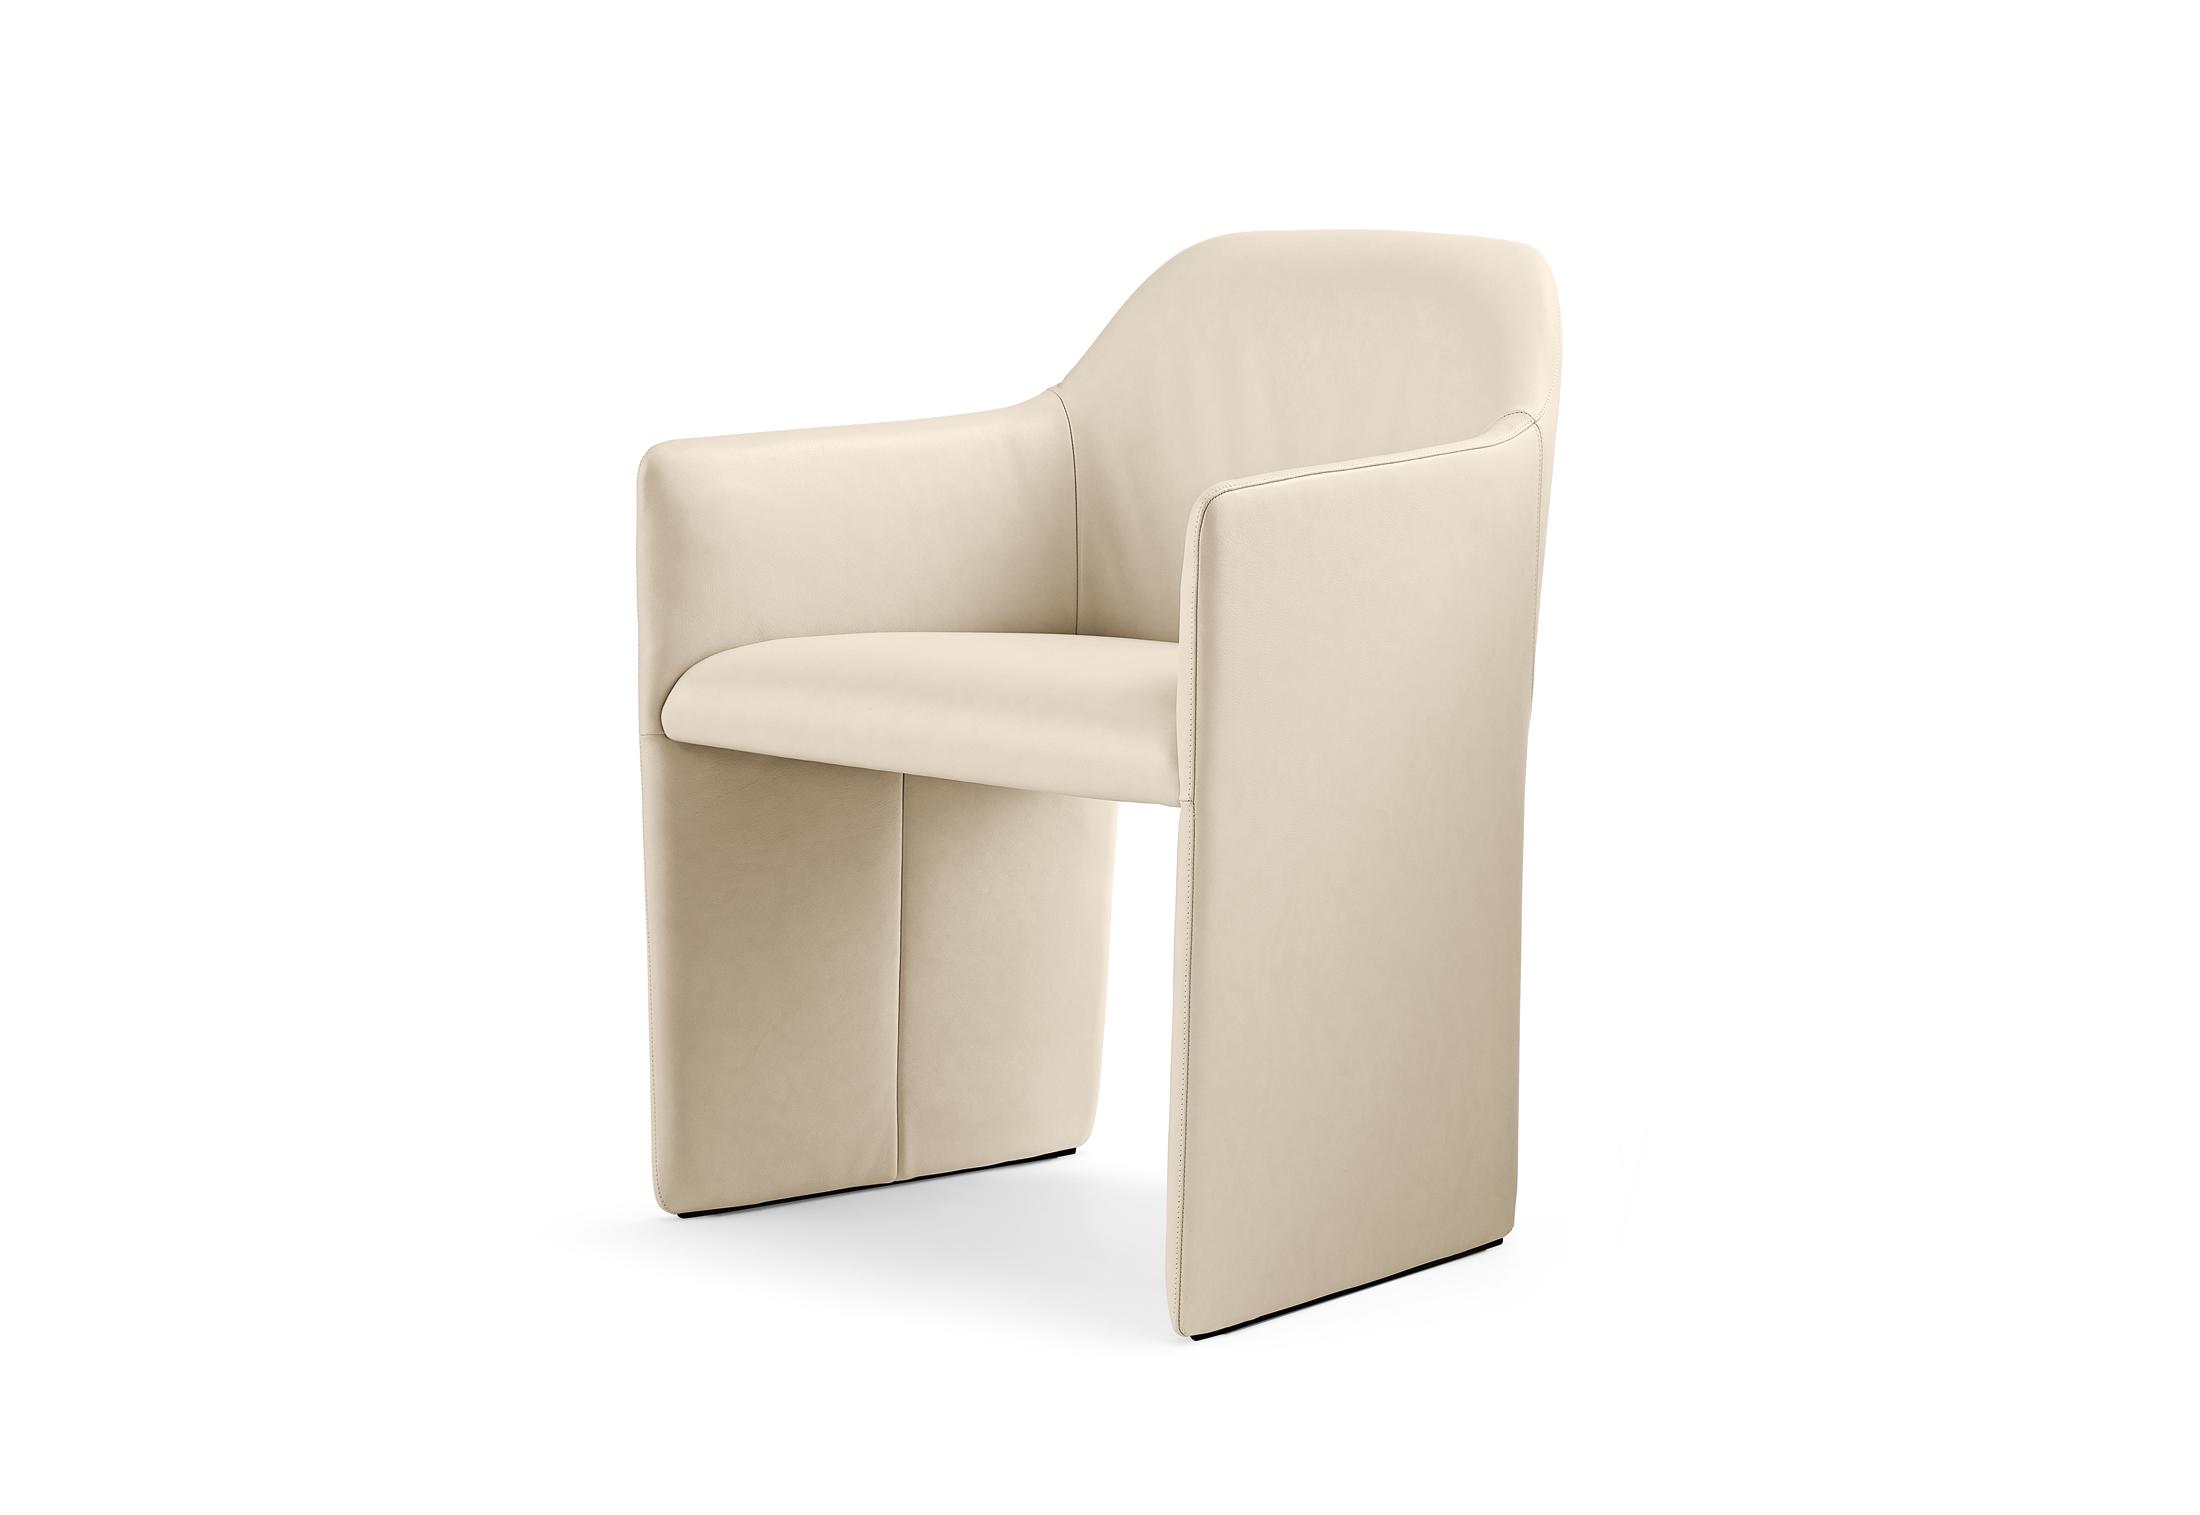 foster 525 von walter knoll stylepark. Black Bedroom Furniture Sets. Home Design Ideas